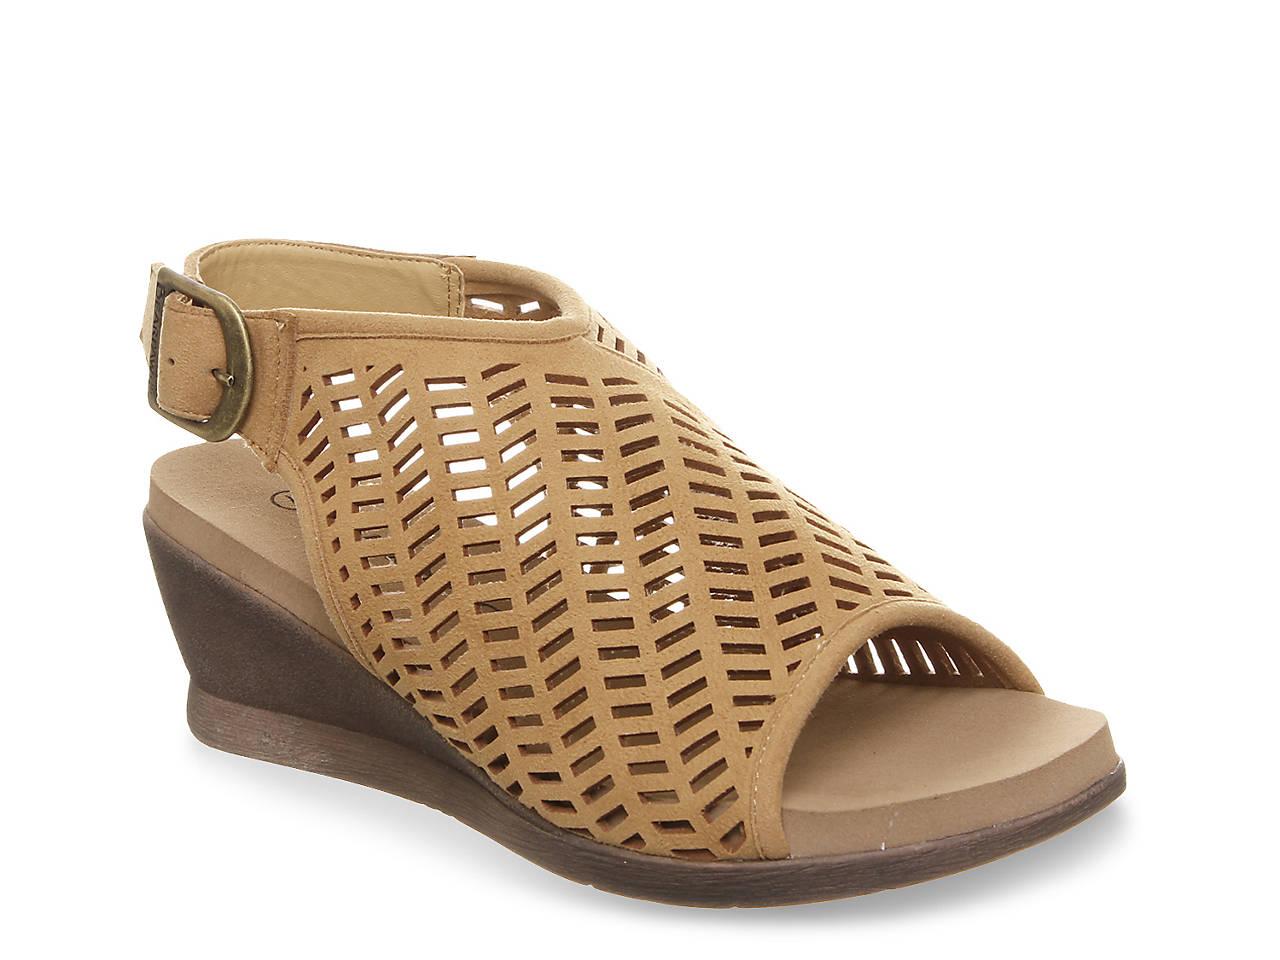 e632cf1330cb Bearpaw Roxie Wedge Sandal Women s Shoes